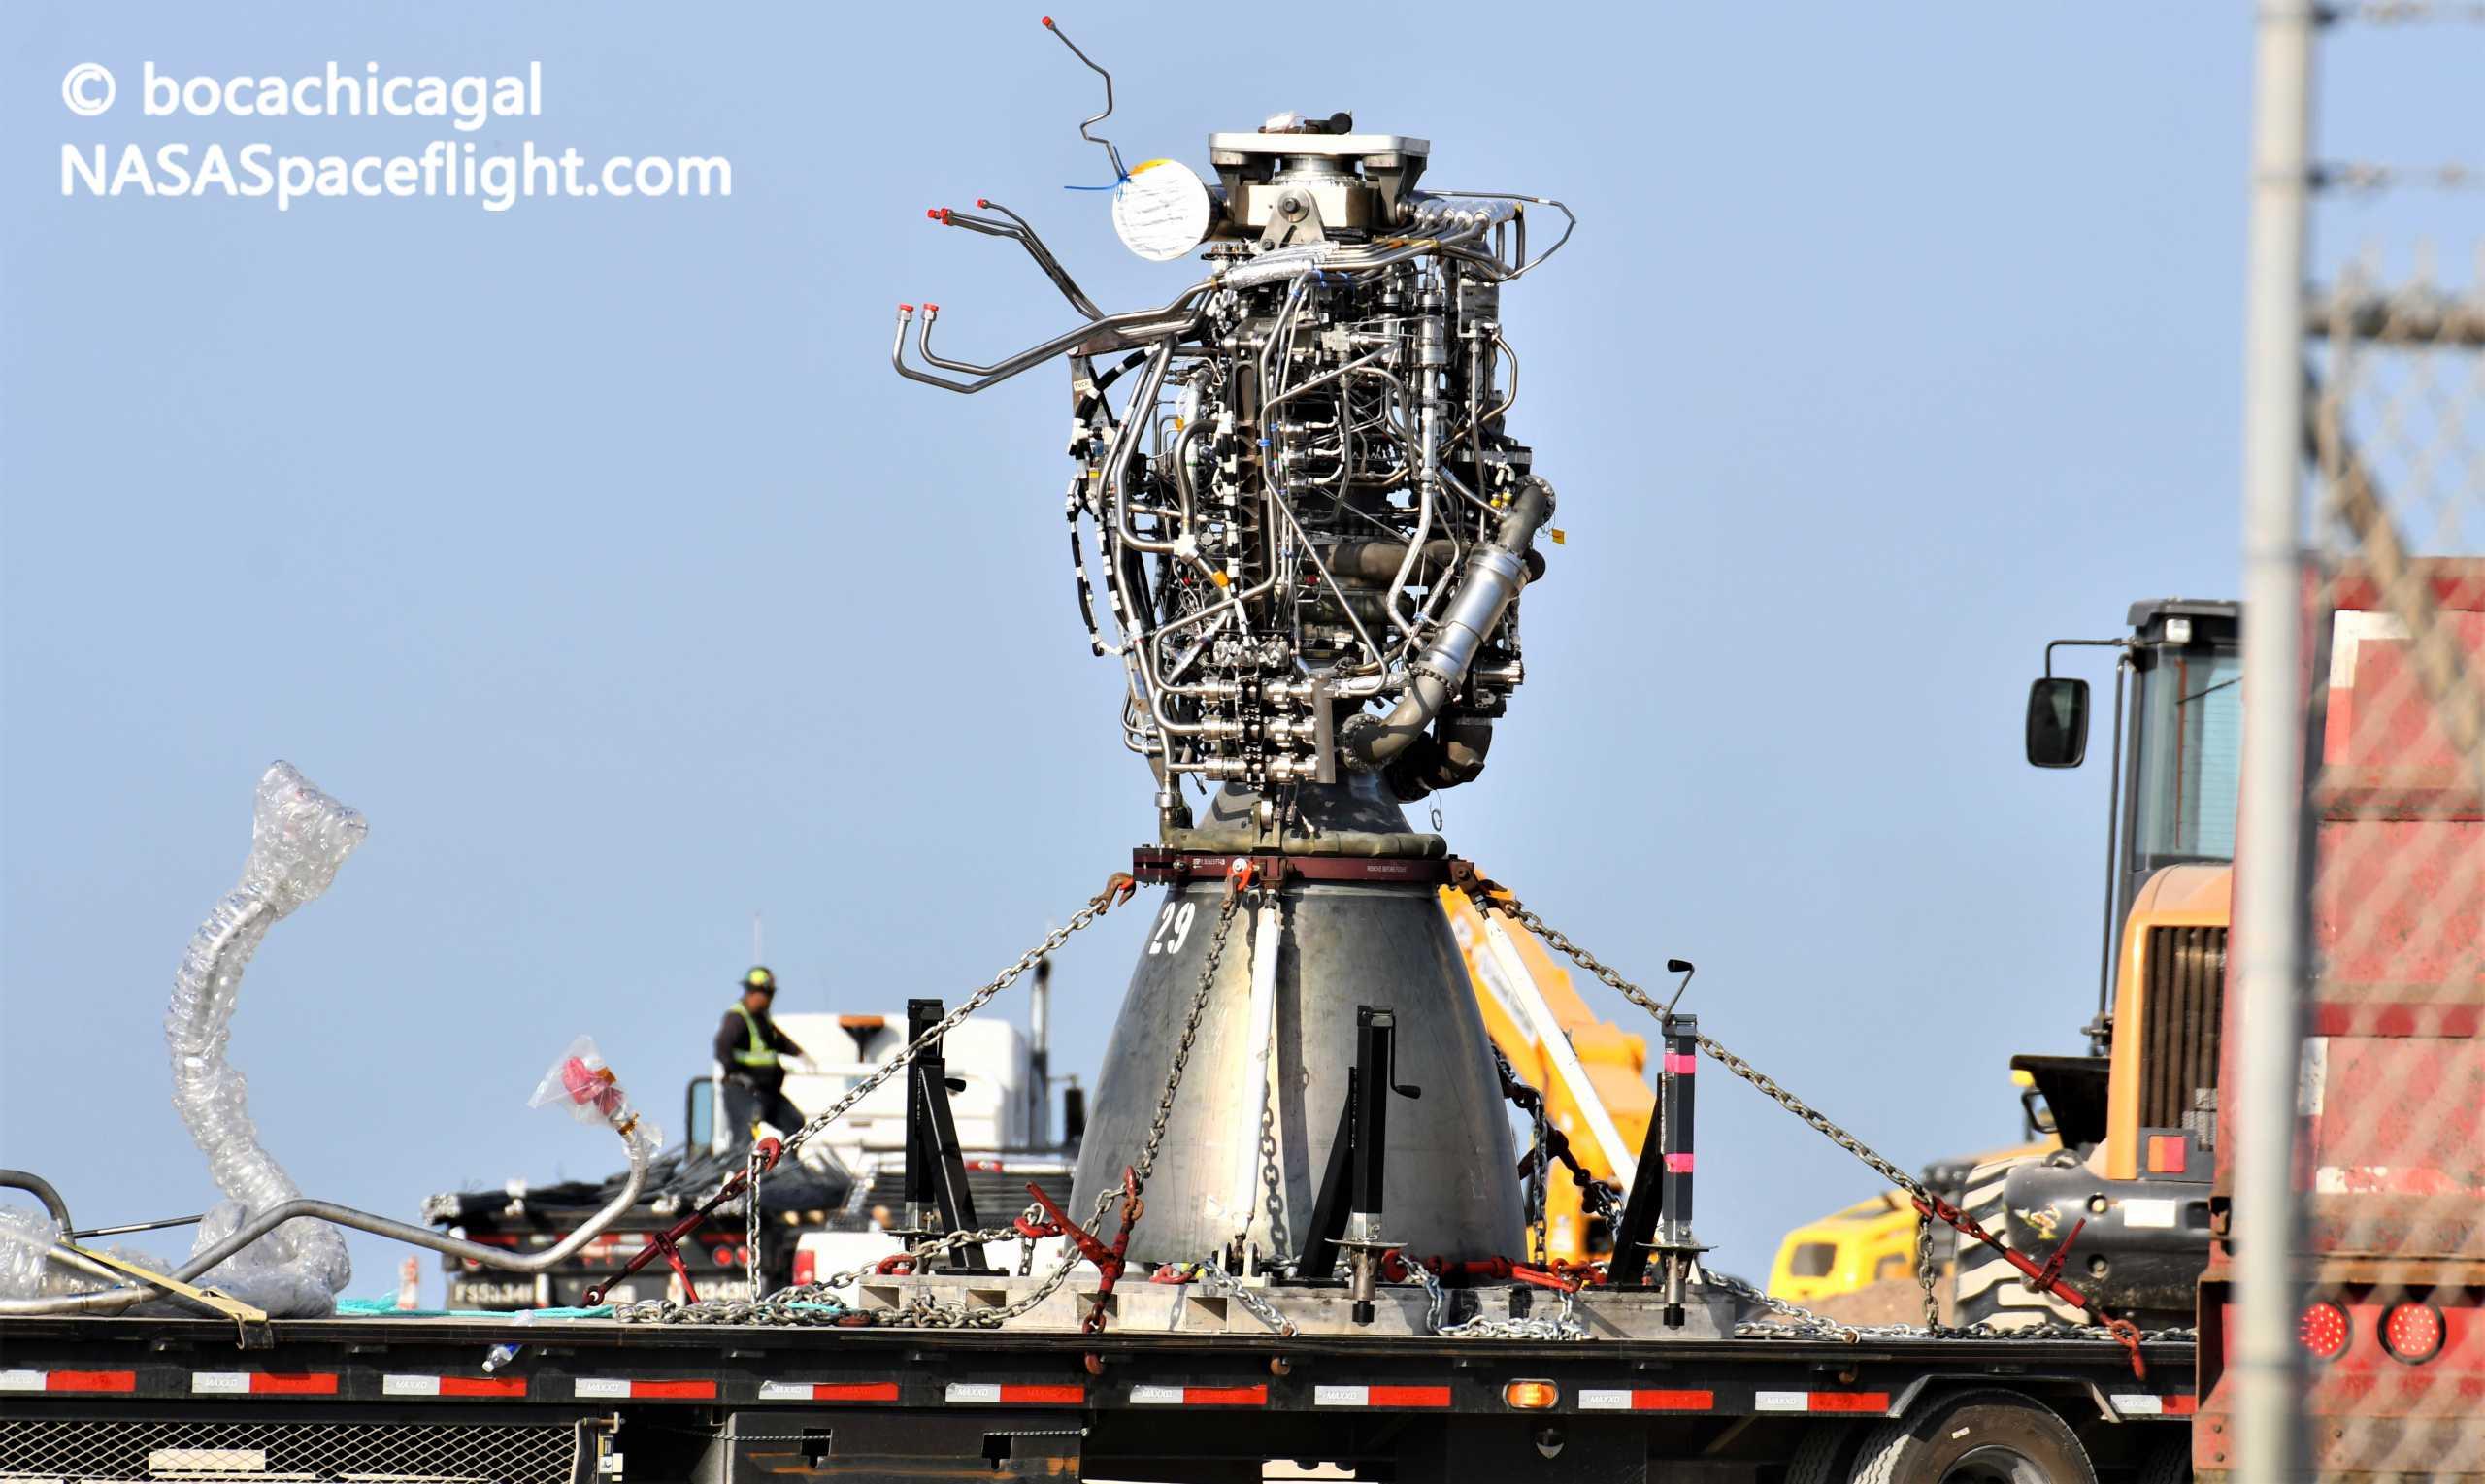 Starship Boca Chica 081820 (NASASpaceflight – bocachicagal) SN6 Raptor SN29 install 2 crop (c)